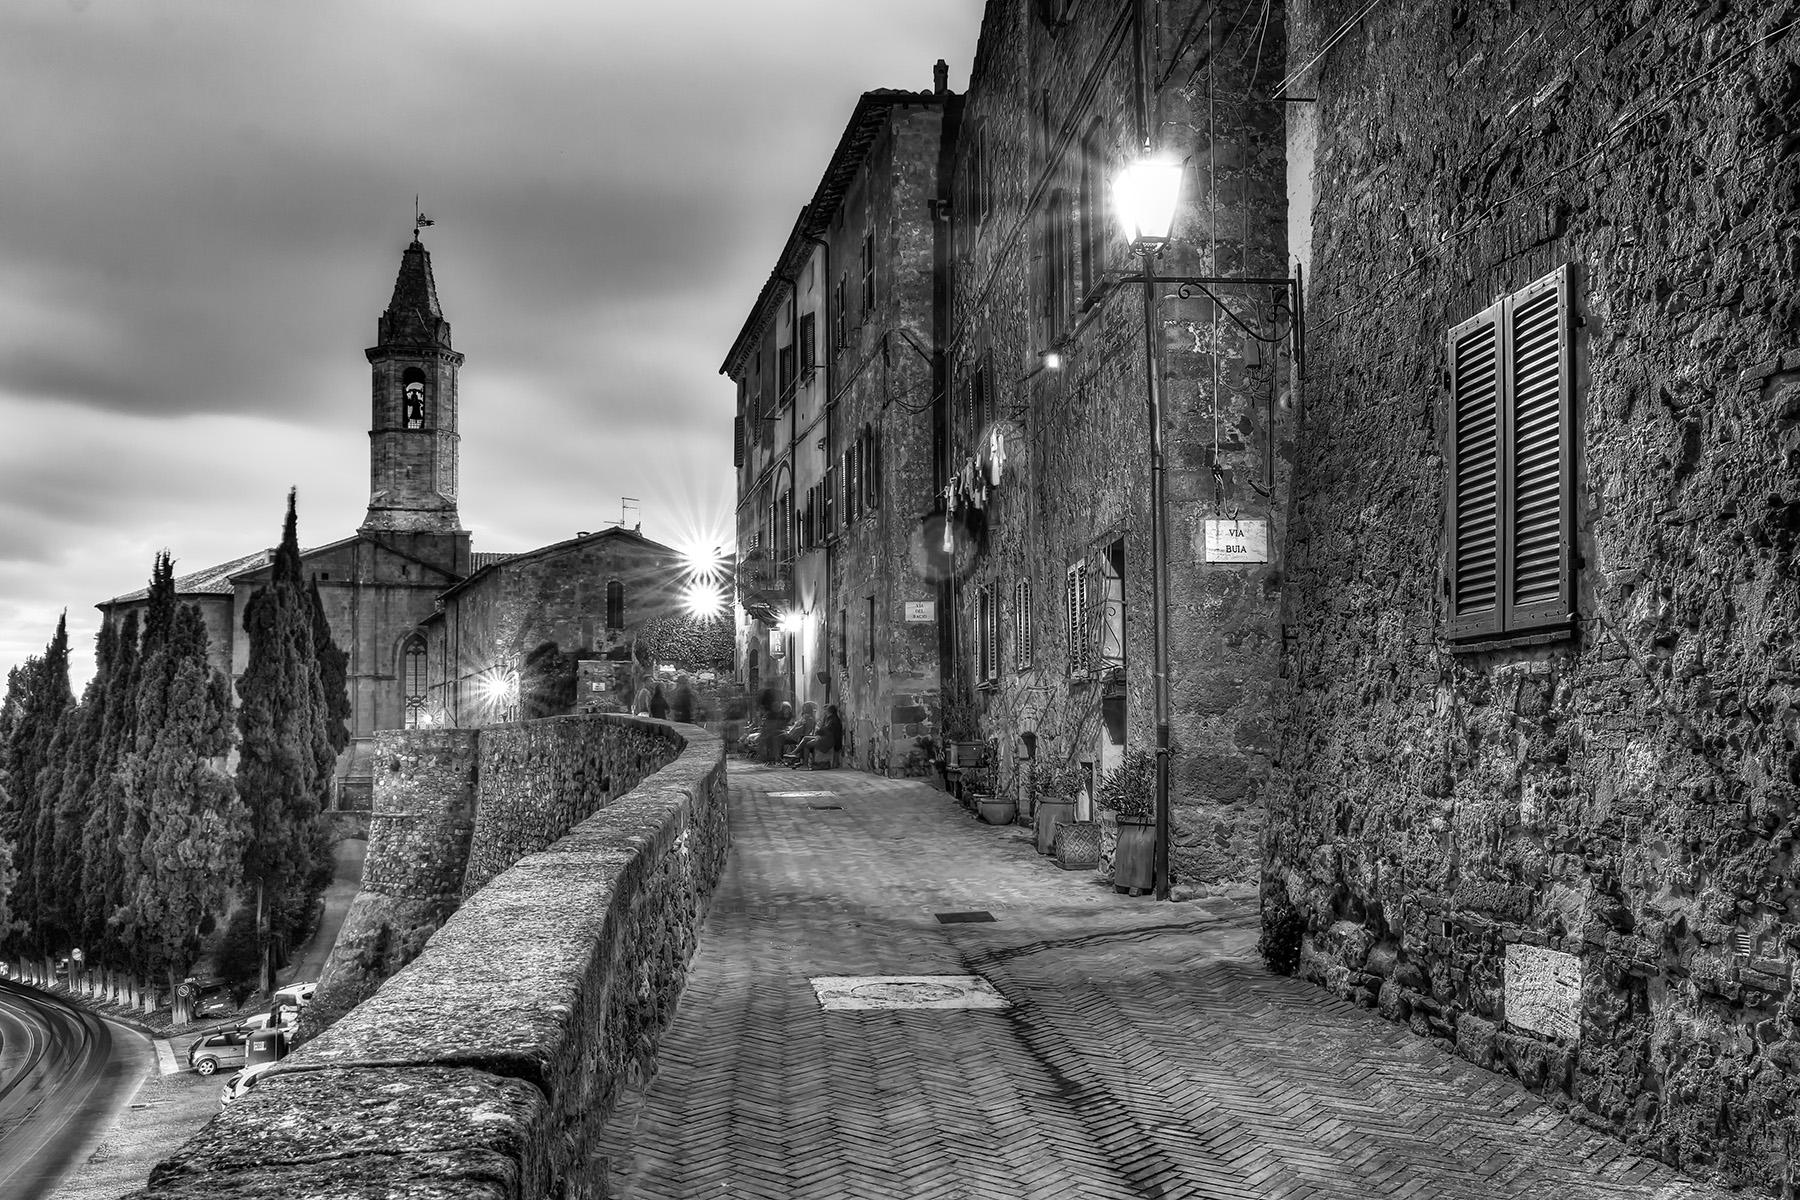 Cattedrale di Santa Maria Assunta at night; Pienza, Italy